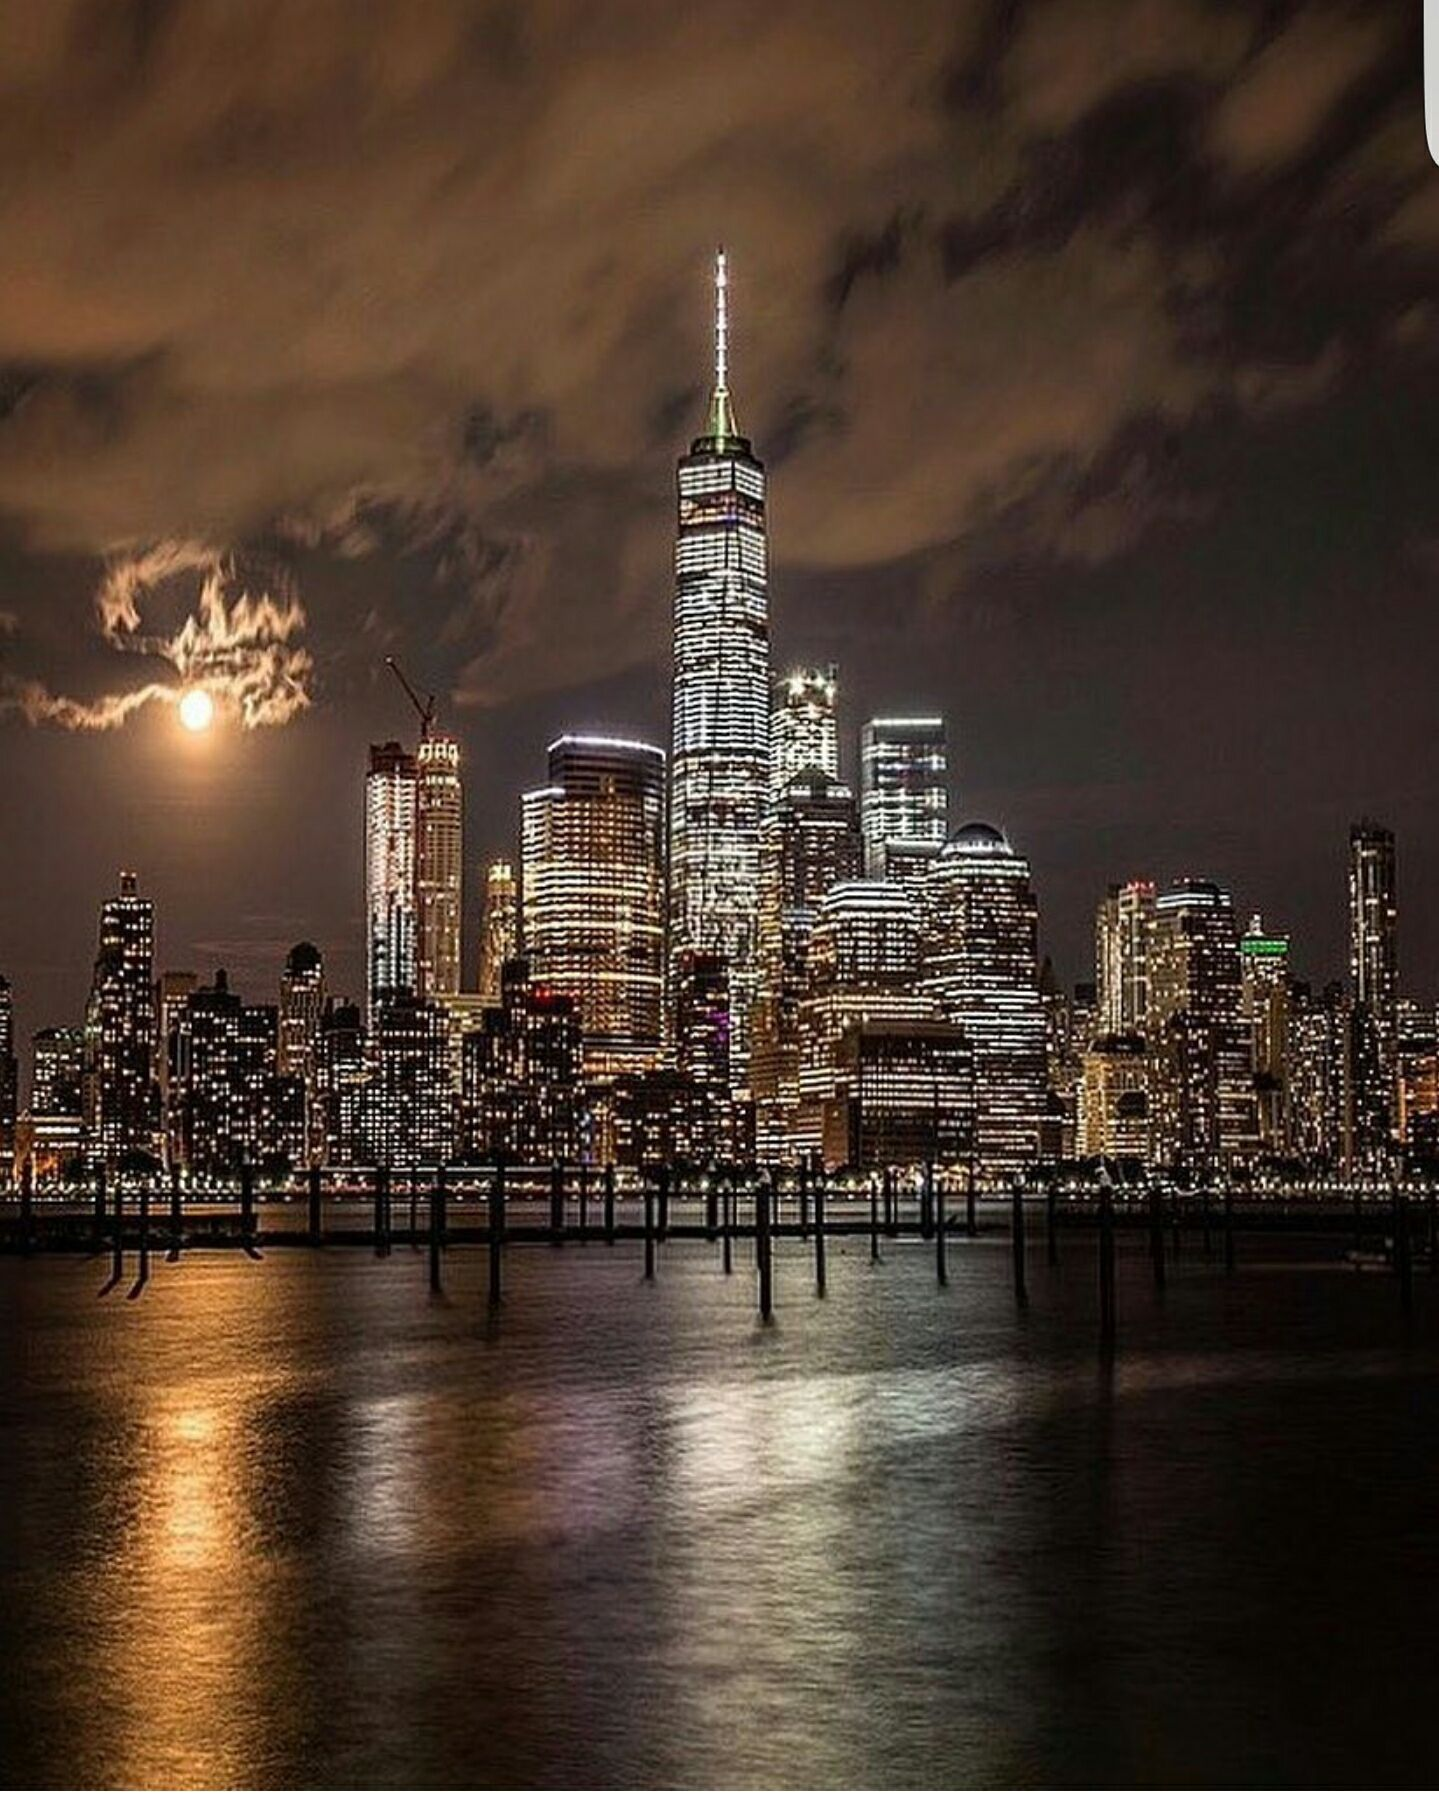 Nyc New York City Travel Honeymoon Backpack Backng Vacation Budgettravel Offtatenpath Bucketlist